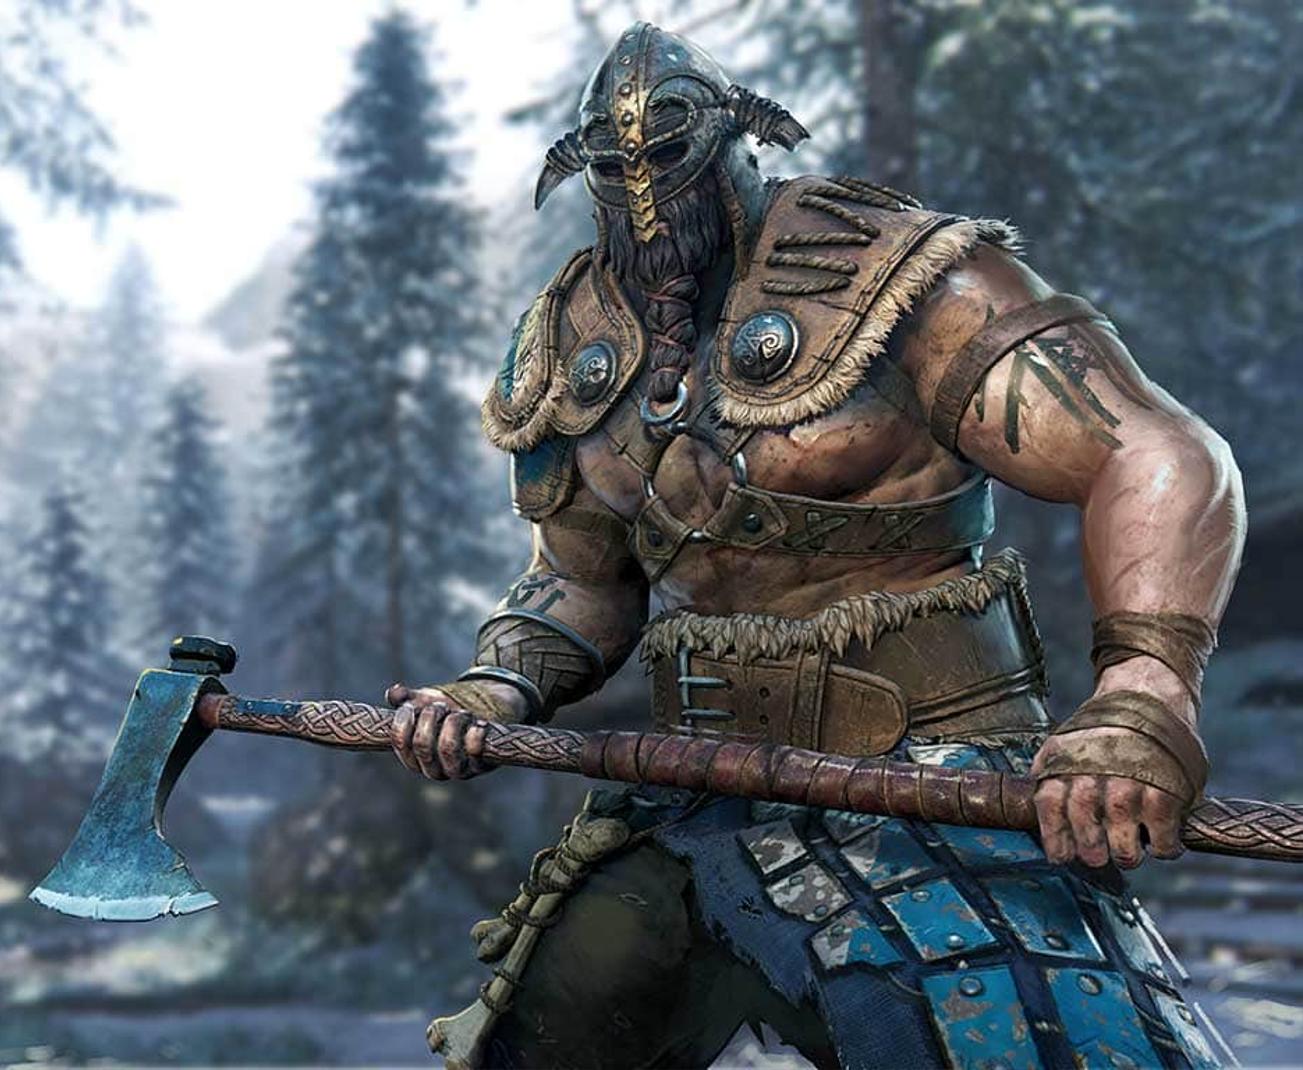 Raider For Honor Viking For Honor Characters Vikings